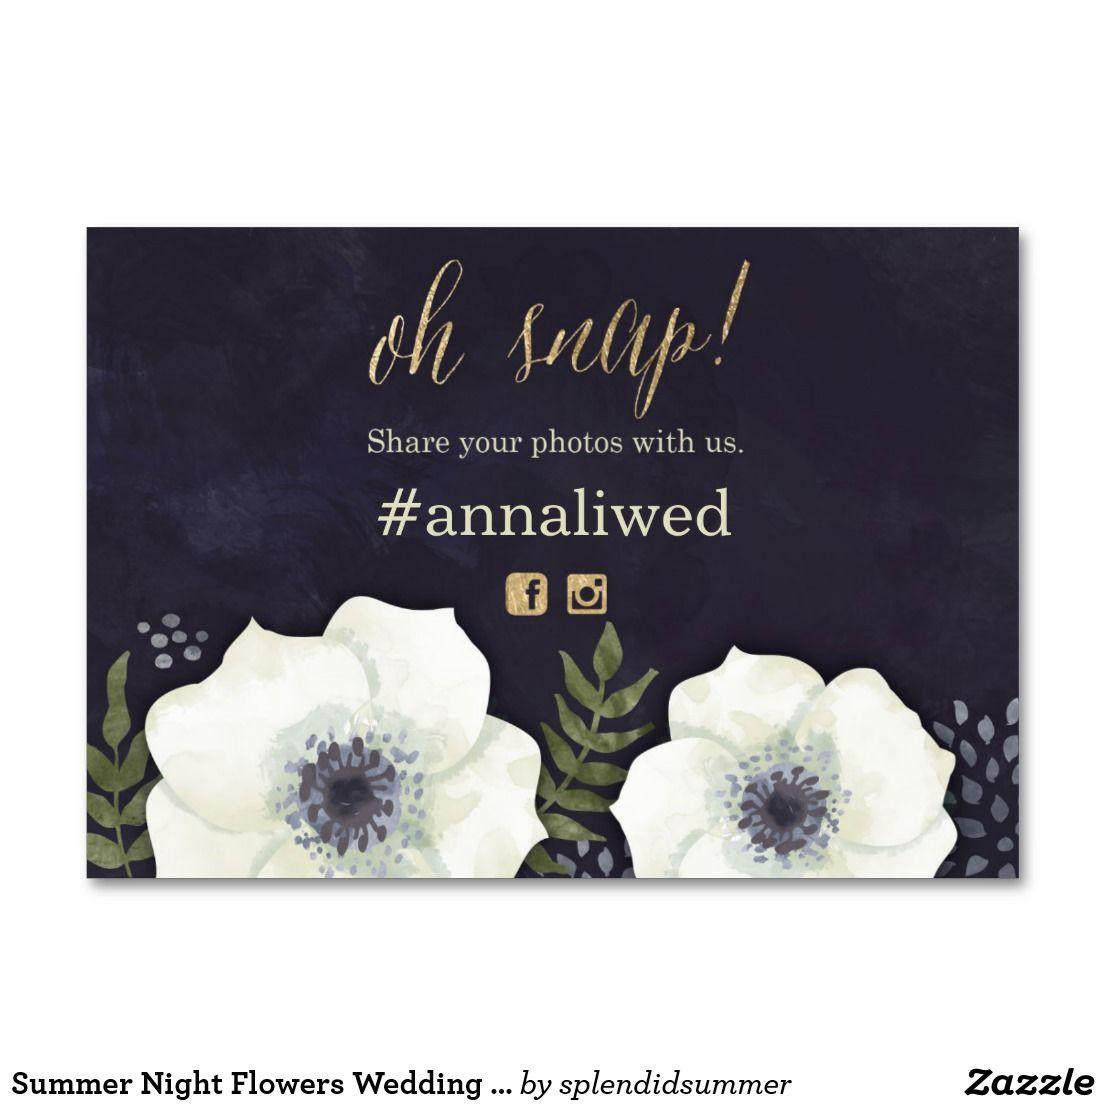 Summer Night Flowers Wedding Photo Hashtag Card